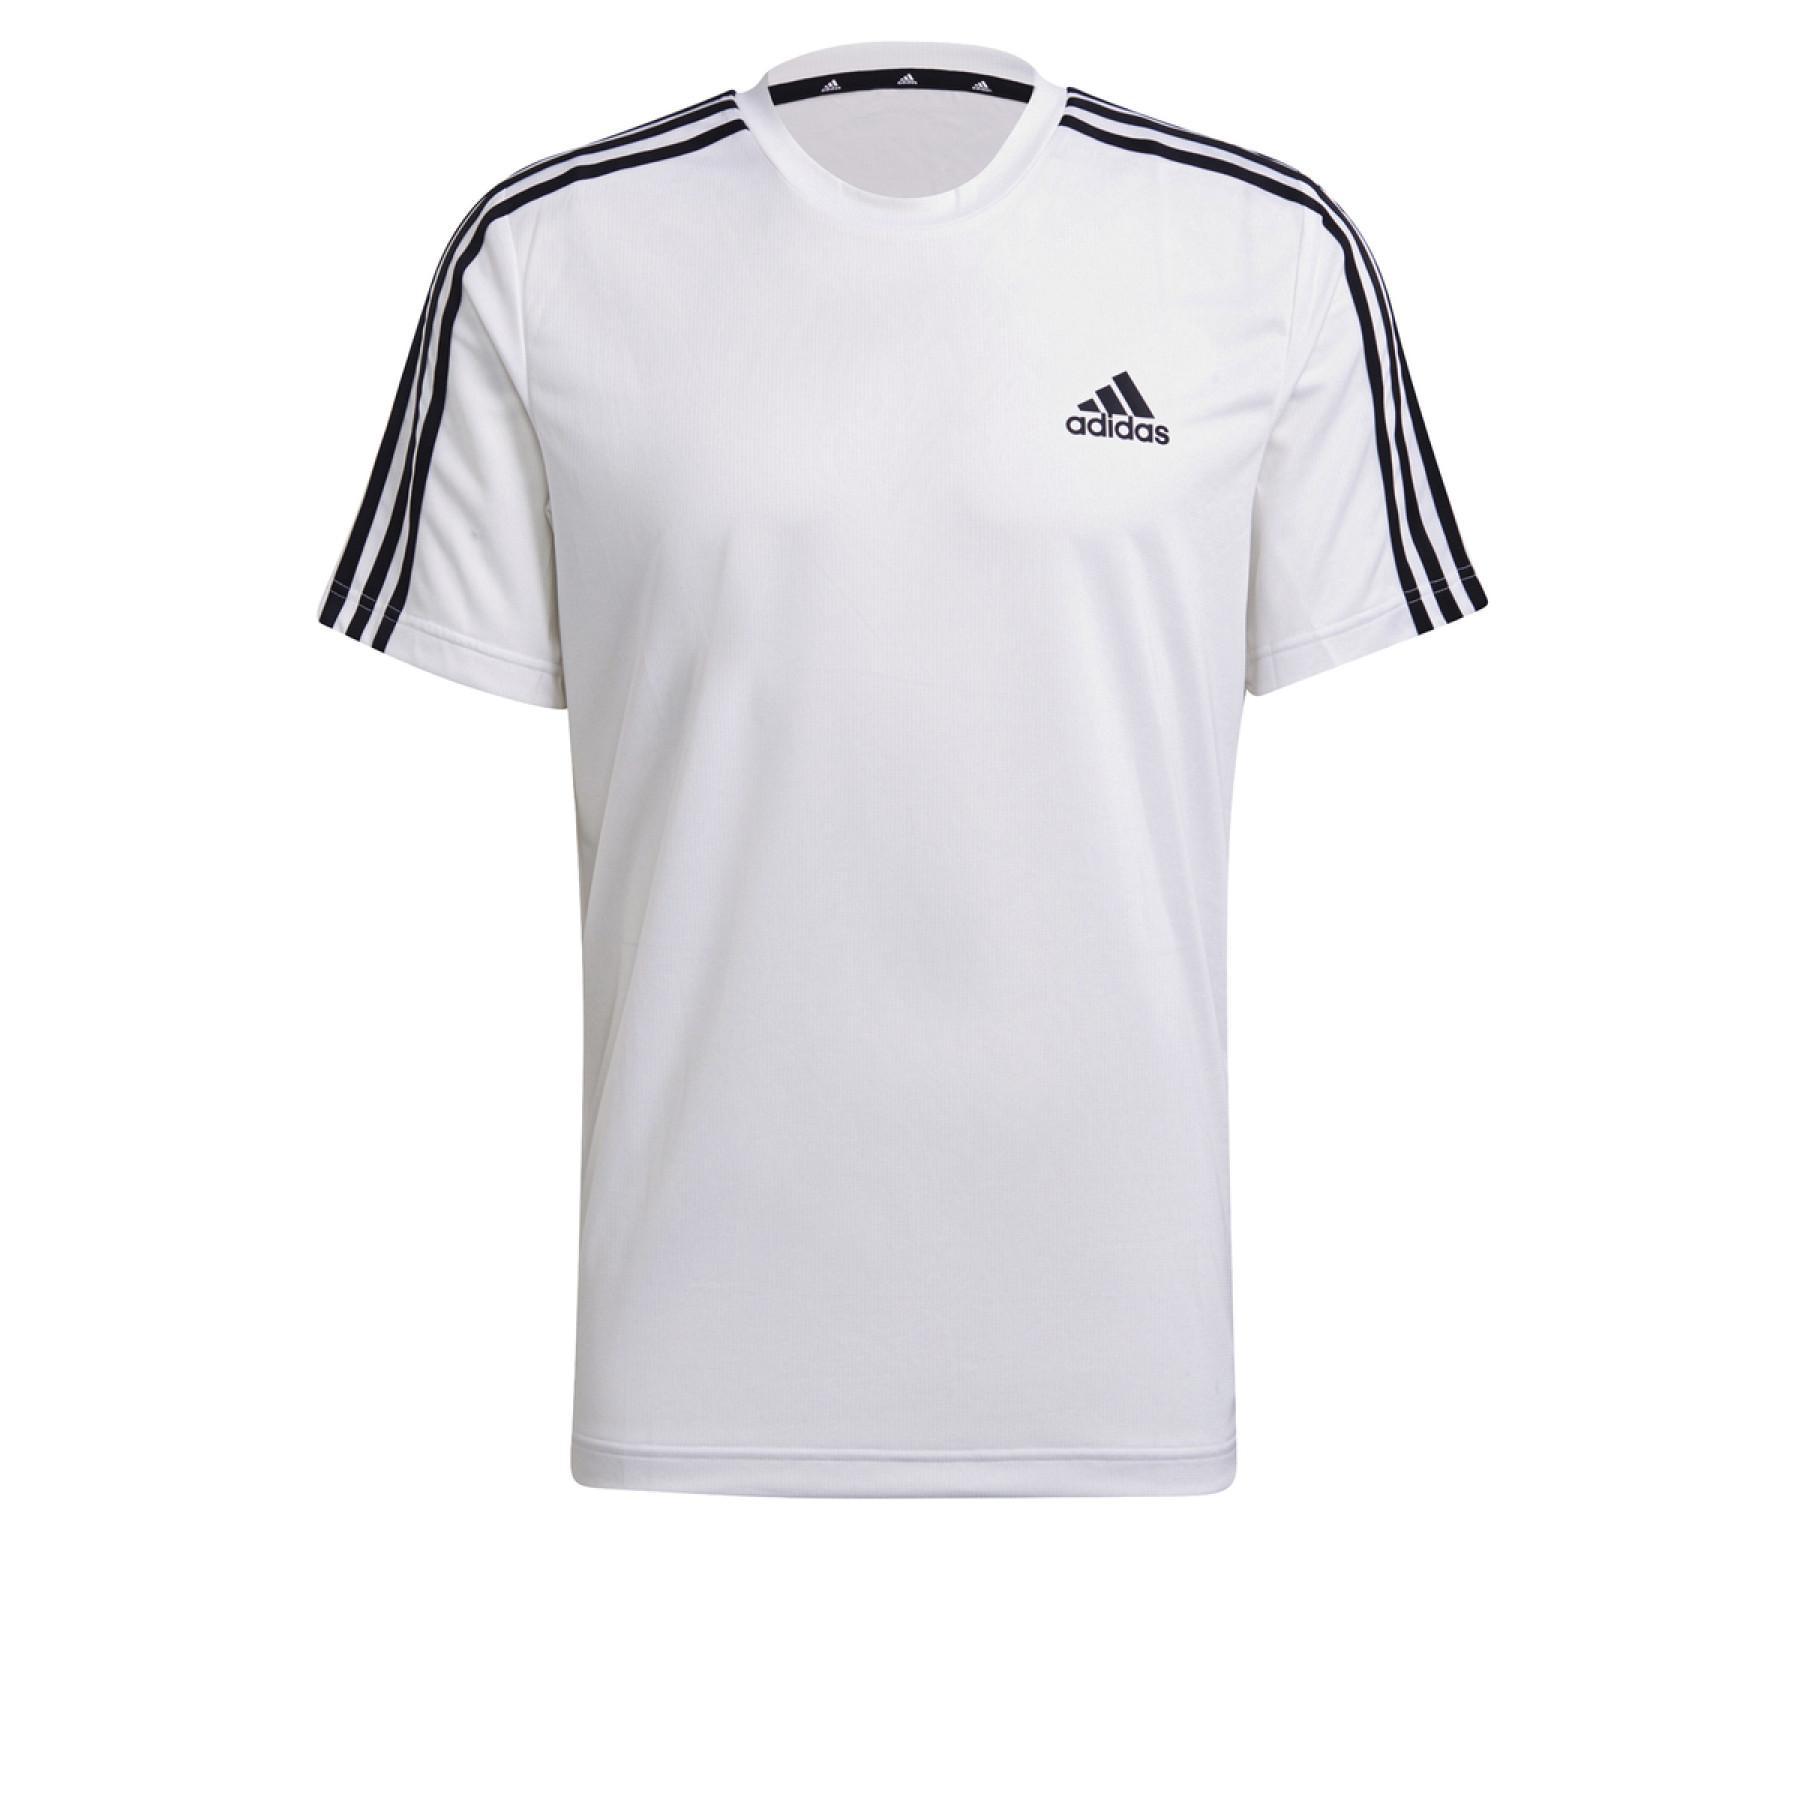 T-shirt adidas Aeroready Designed To Move Sport 3-Bandes